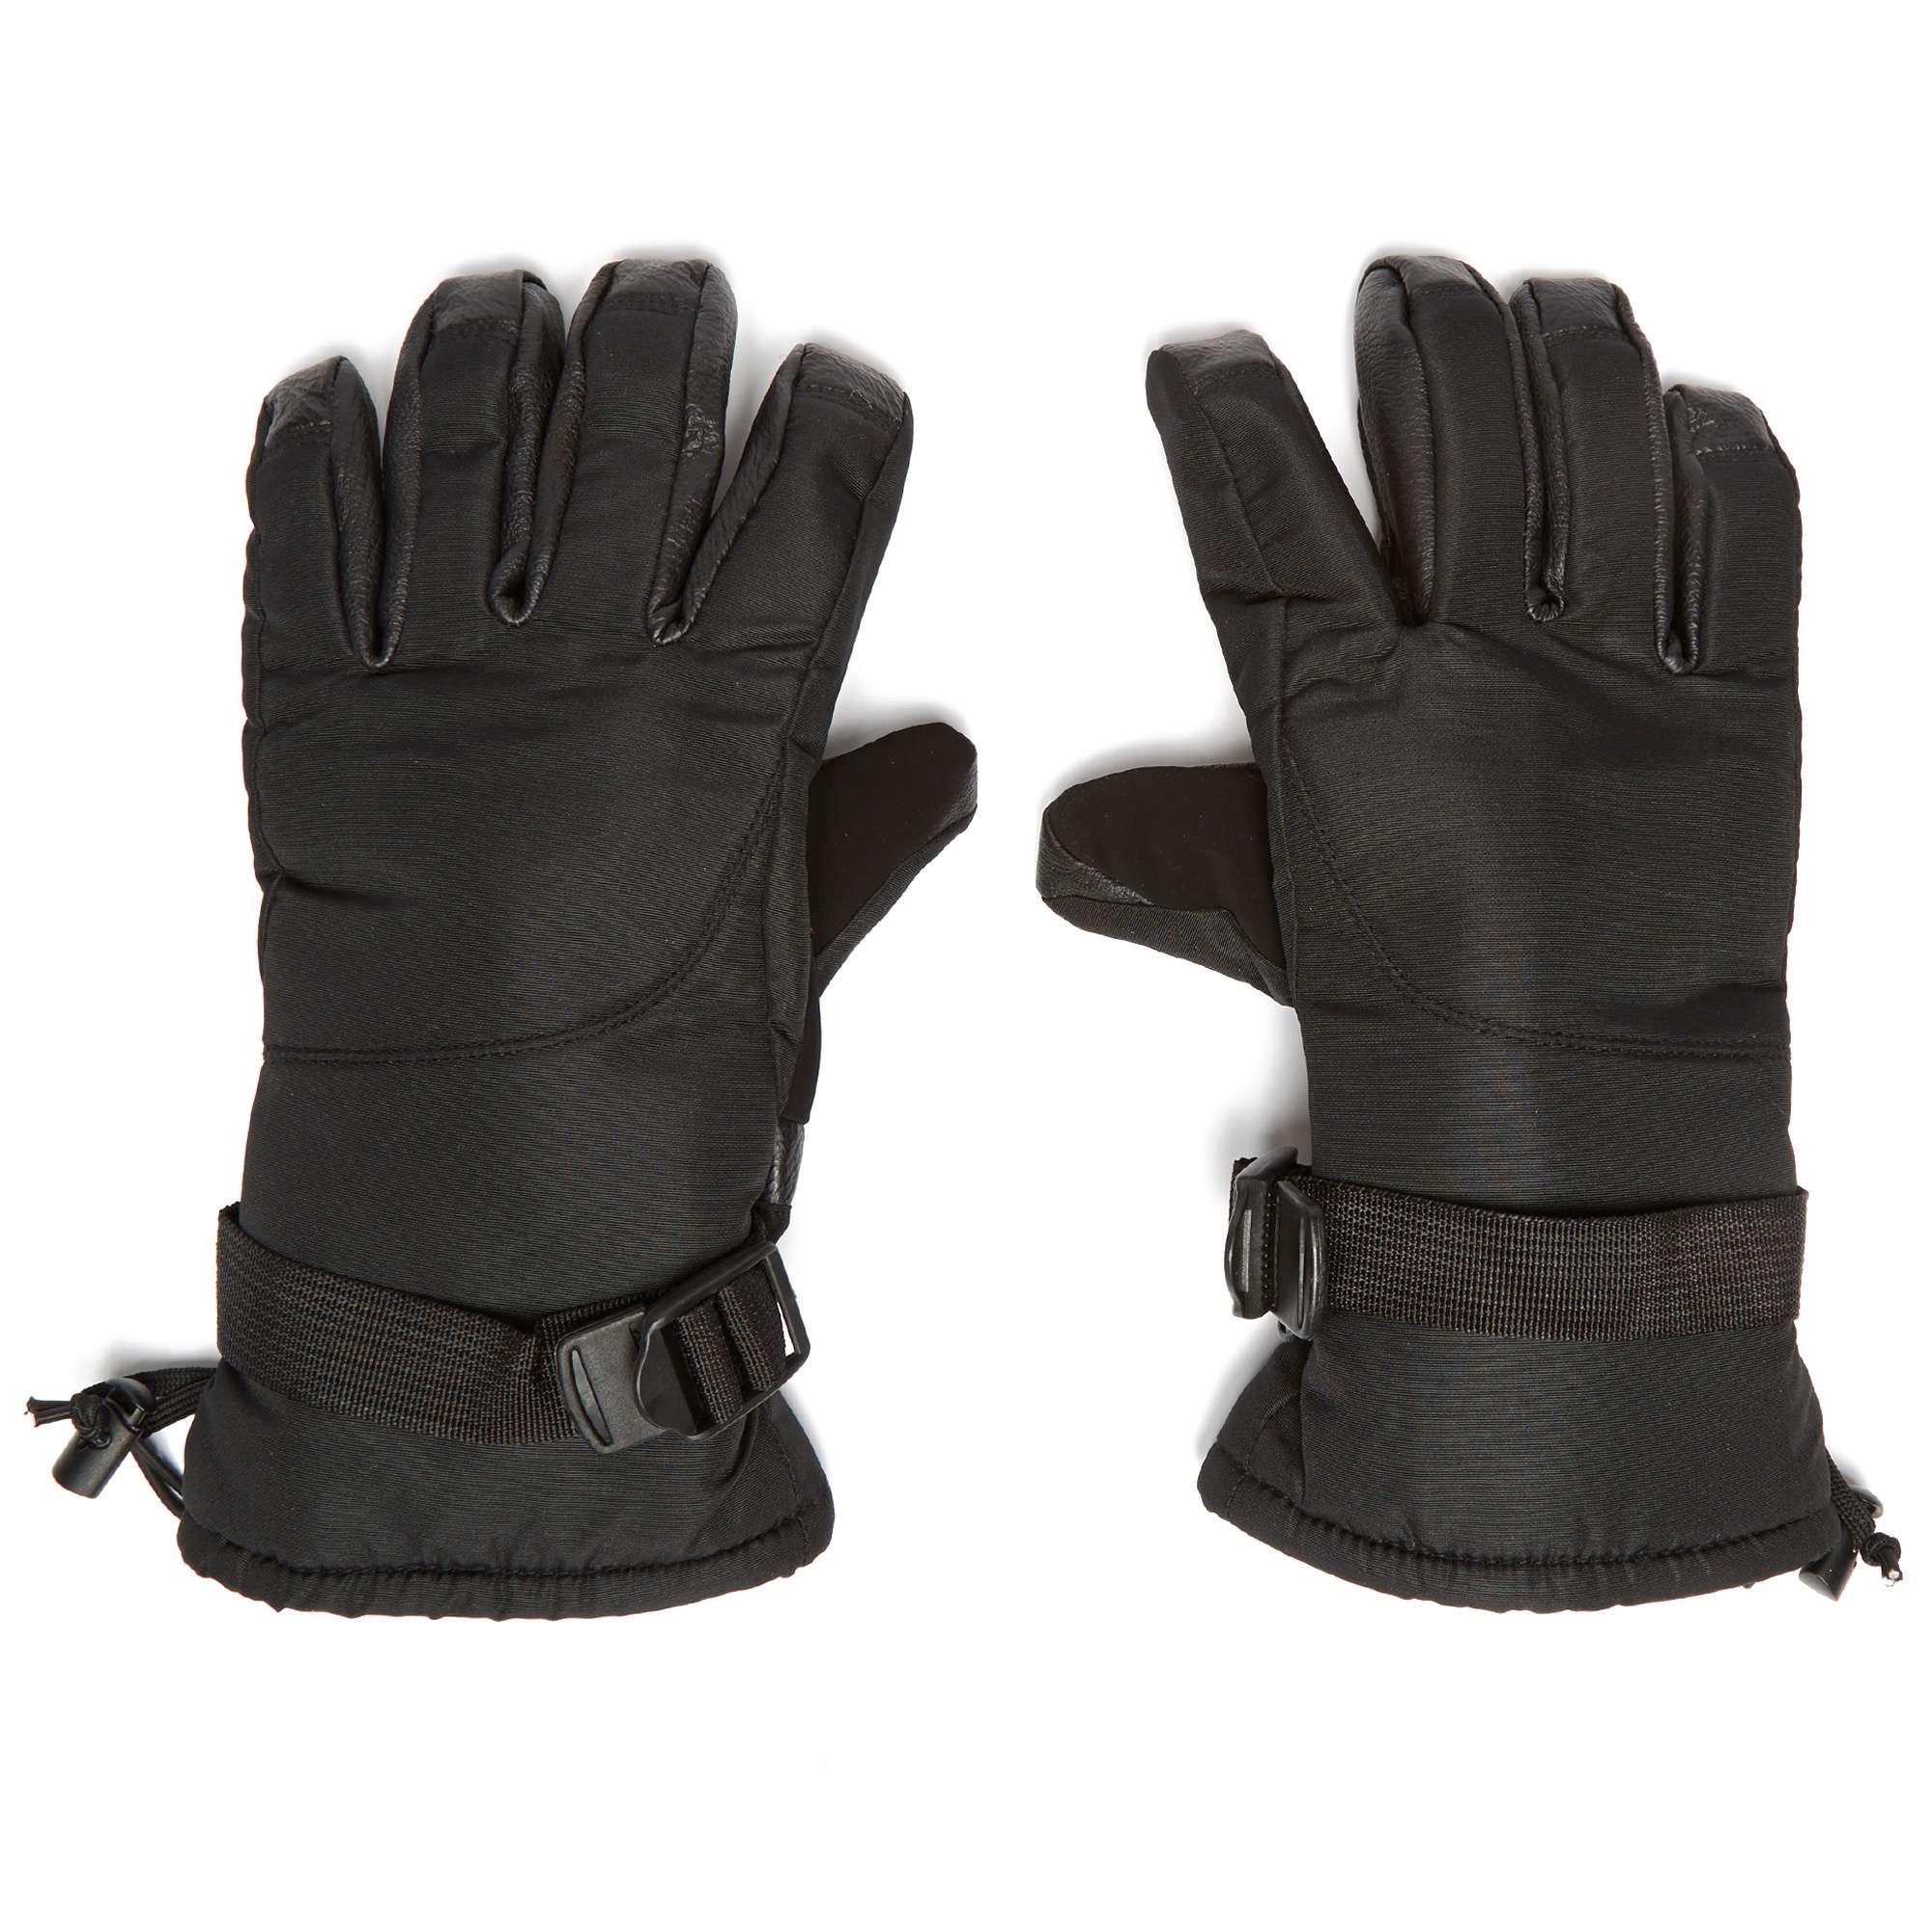 PETER STORM Premier Mountain Gloves